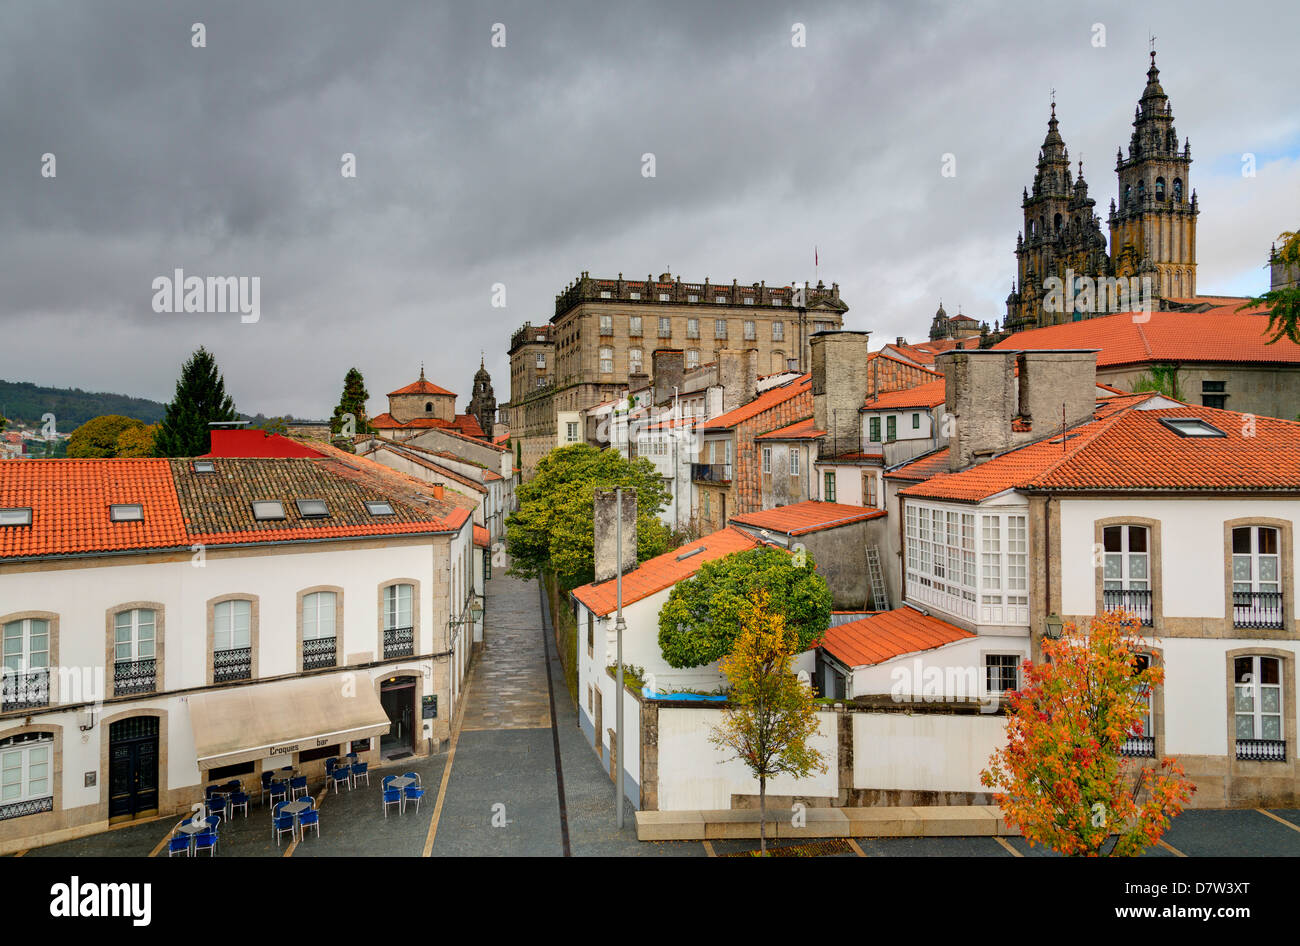 Old Town, Santiago de Compostela, UNESCO World Heritage Site, Galicia, Spain - Stock Image